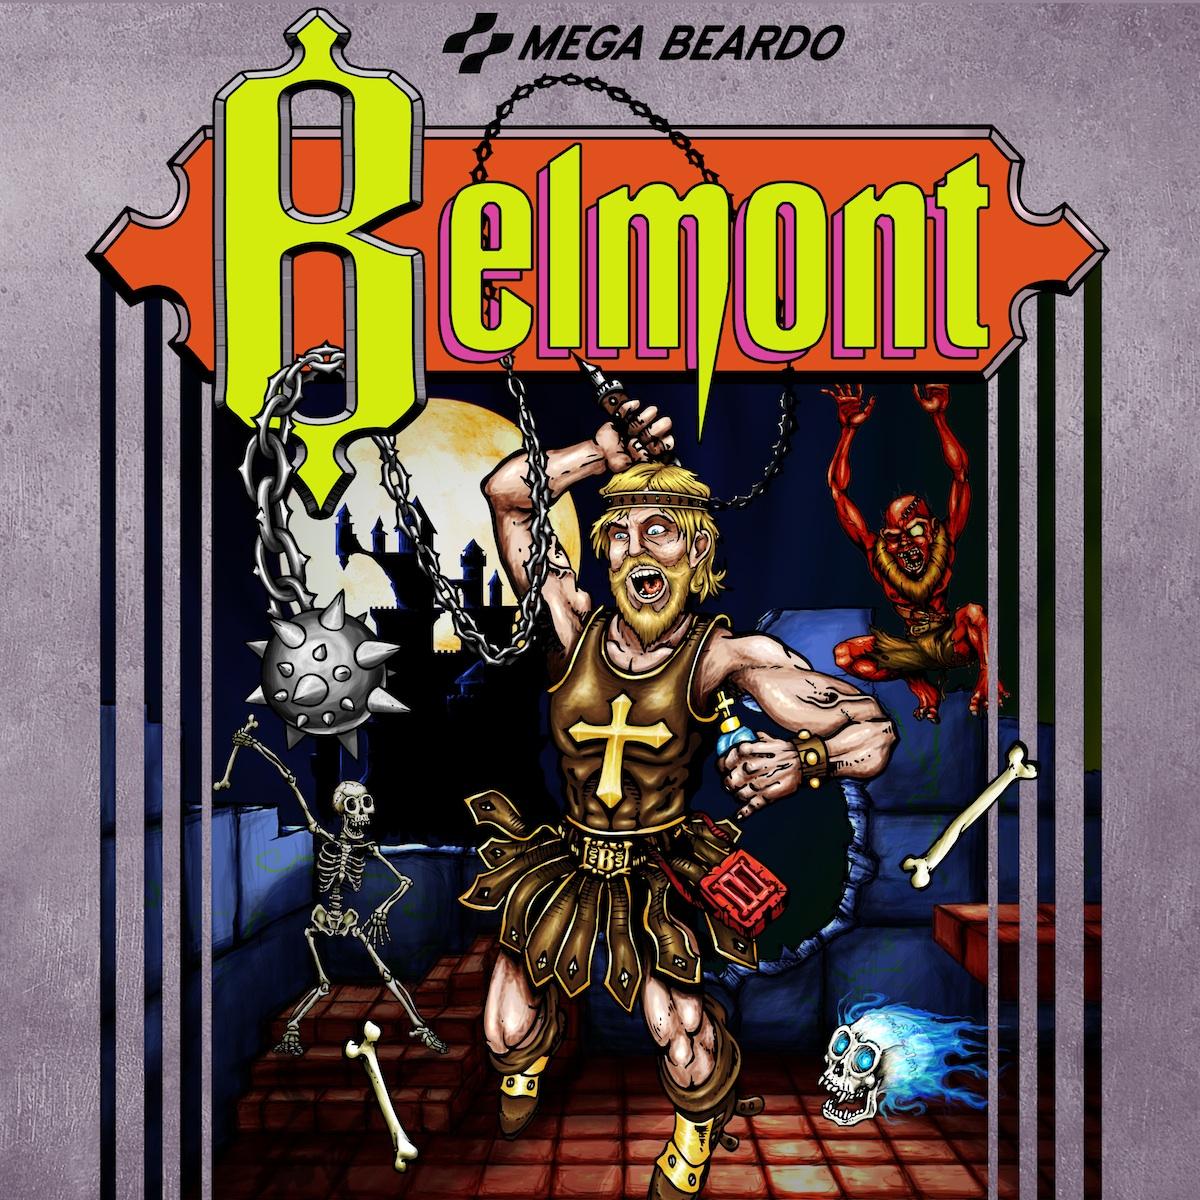 Hey! Listen! Belmont by Mega Beardo, Castlevania Metal Concept Album